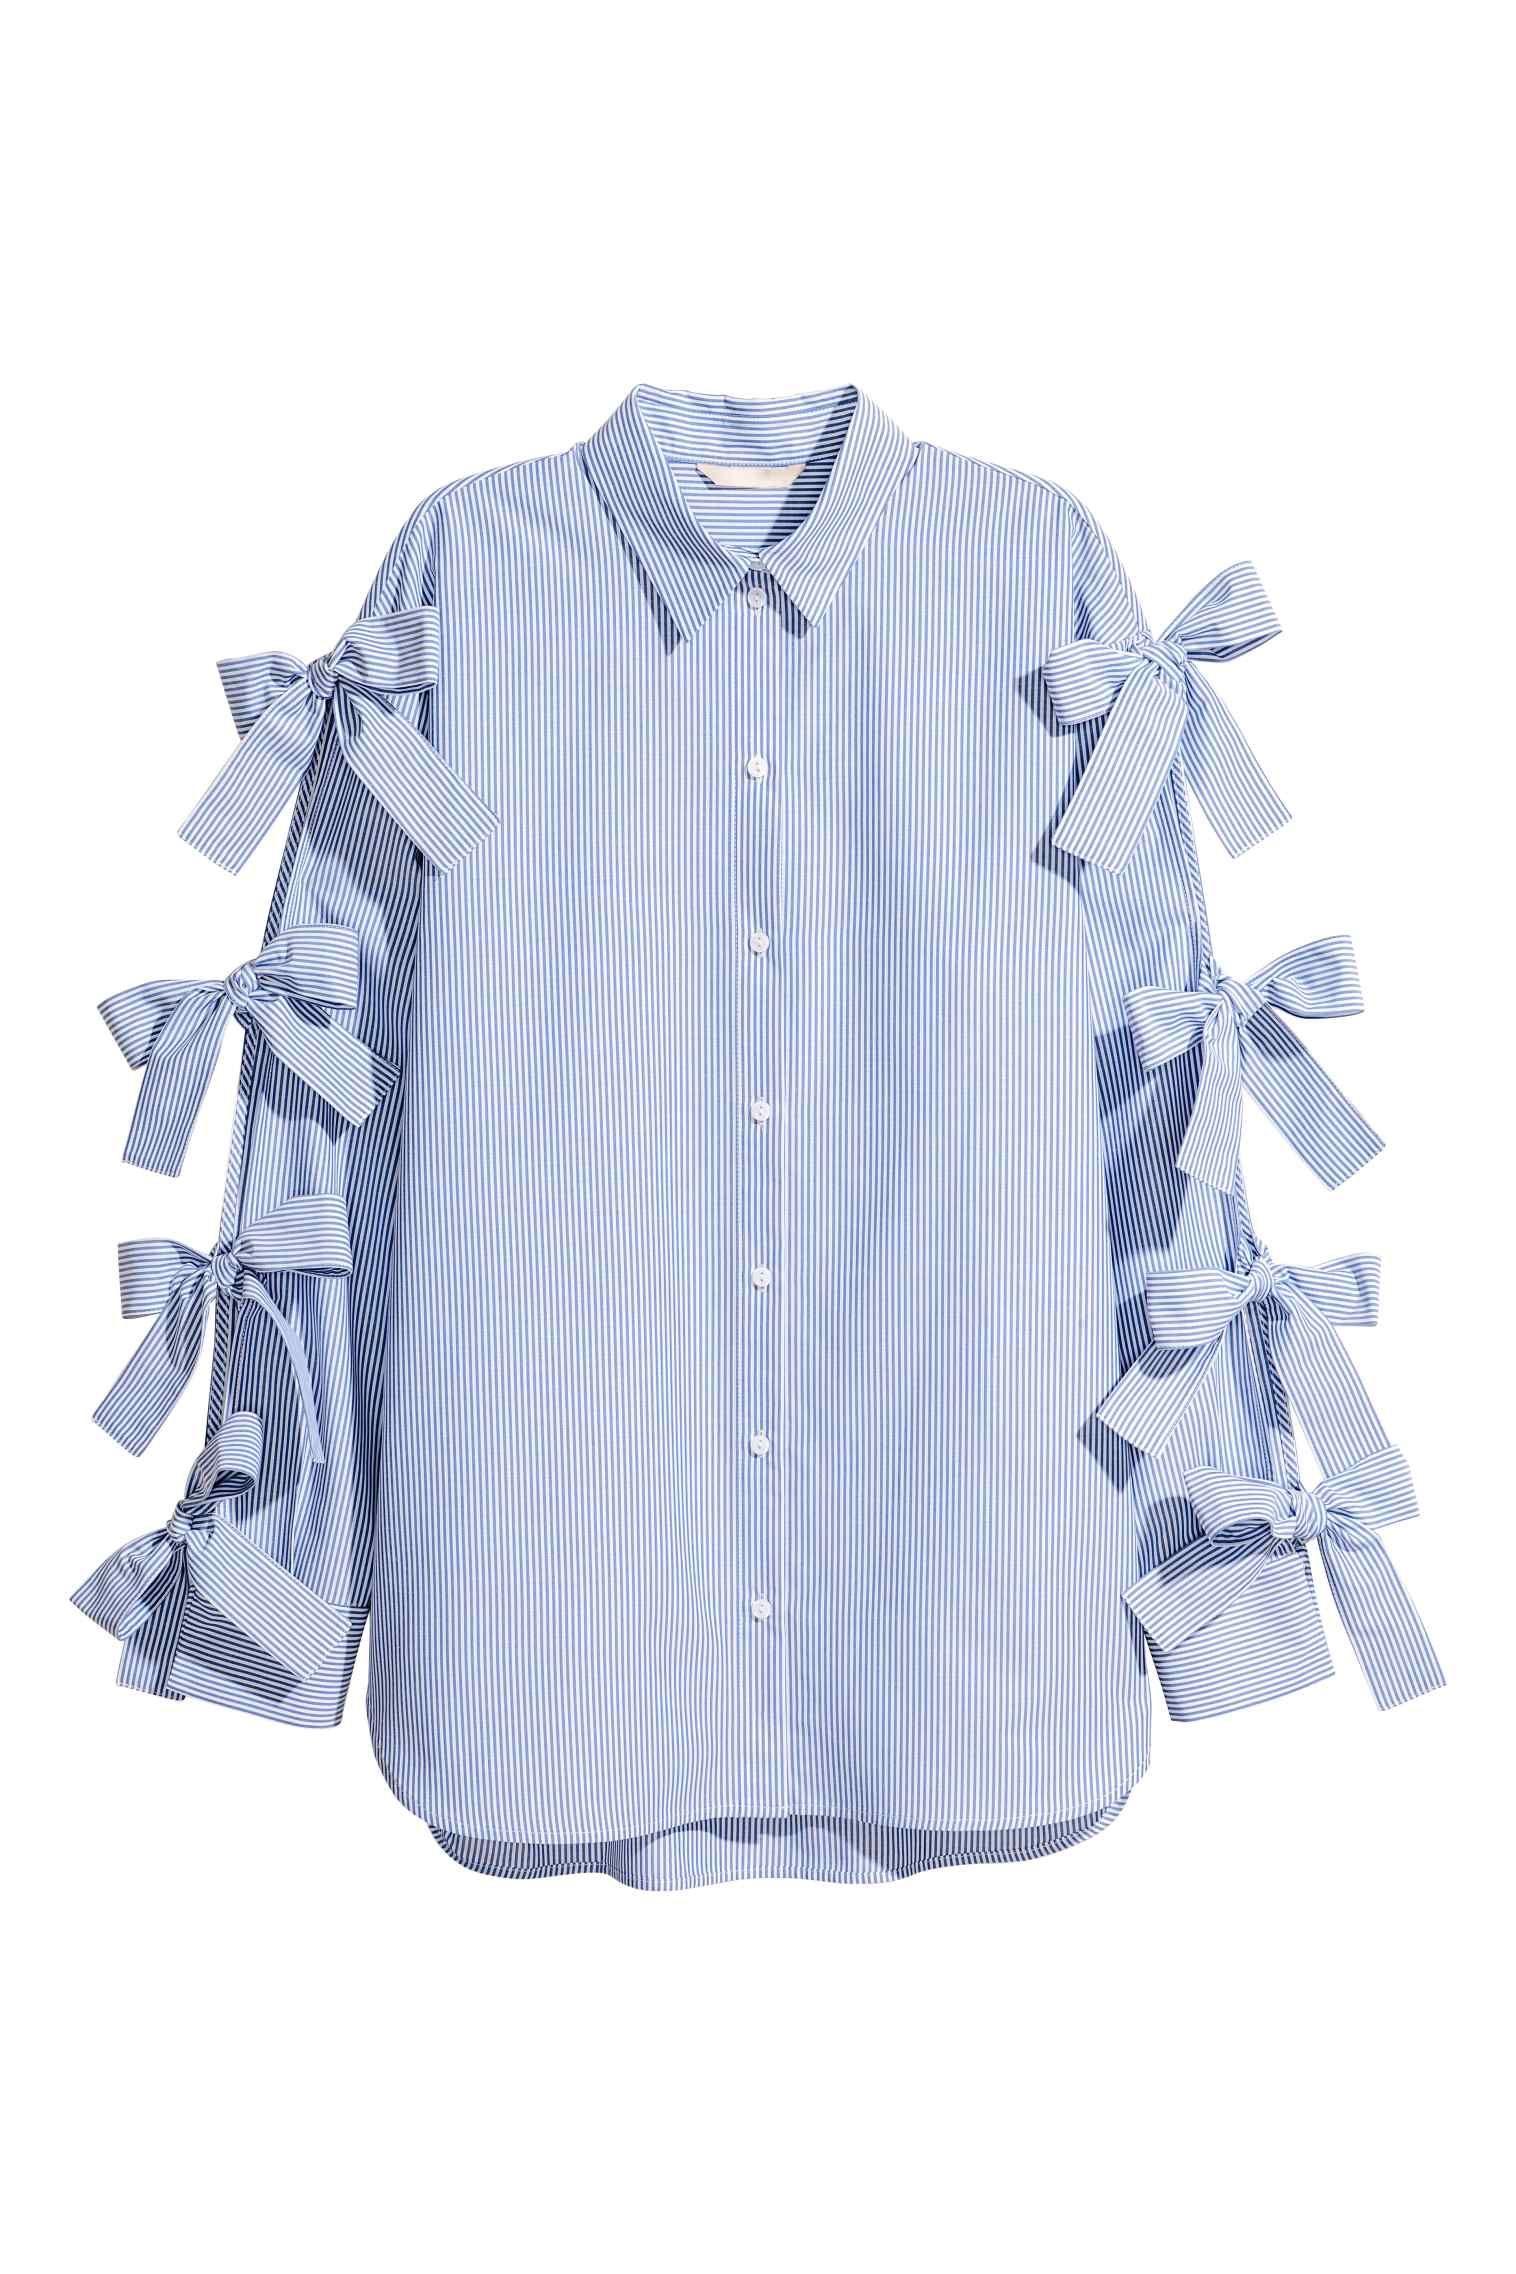 Shirt with ties bluewhitestriped ladies hum things iull